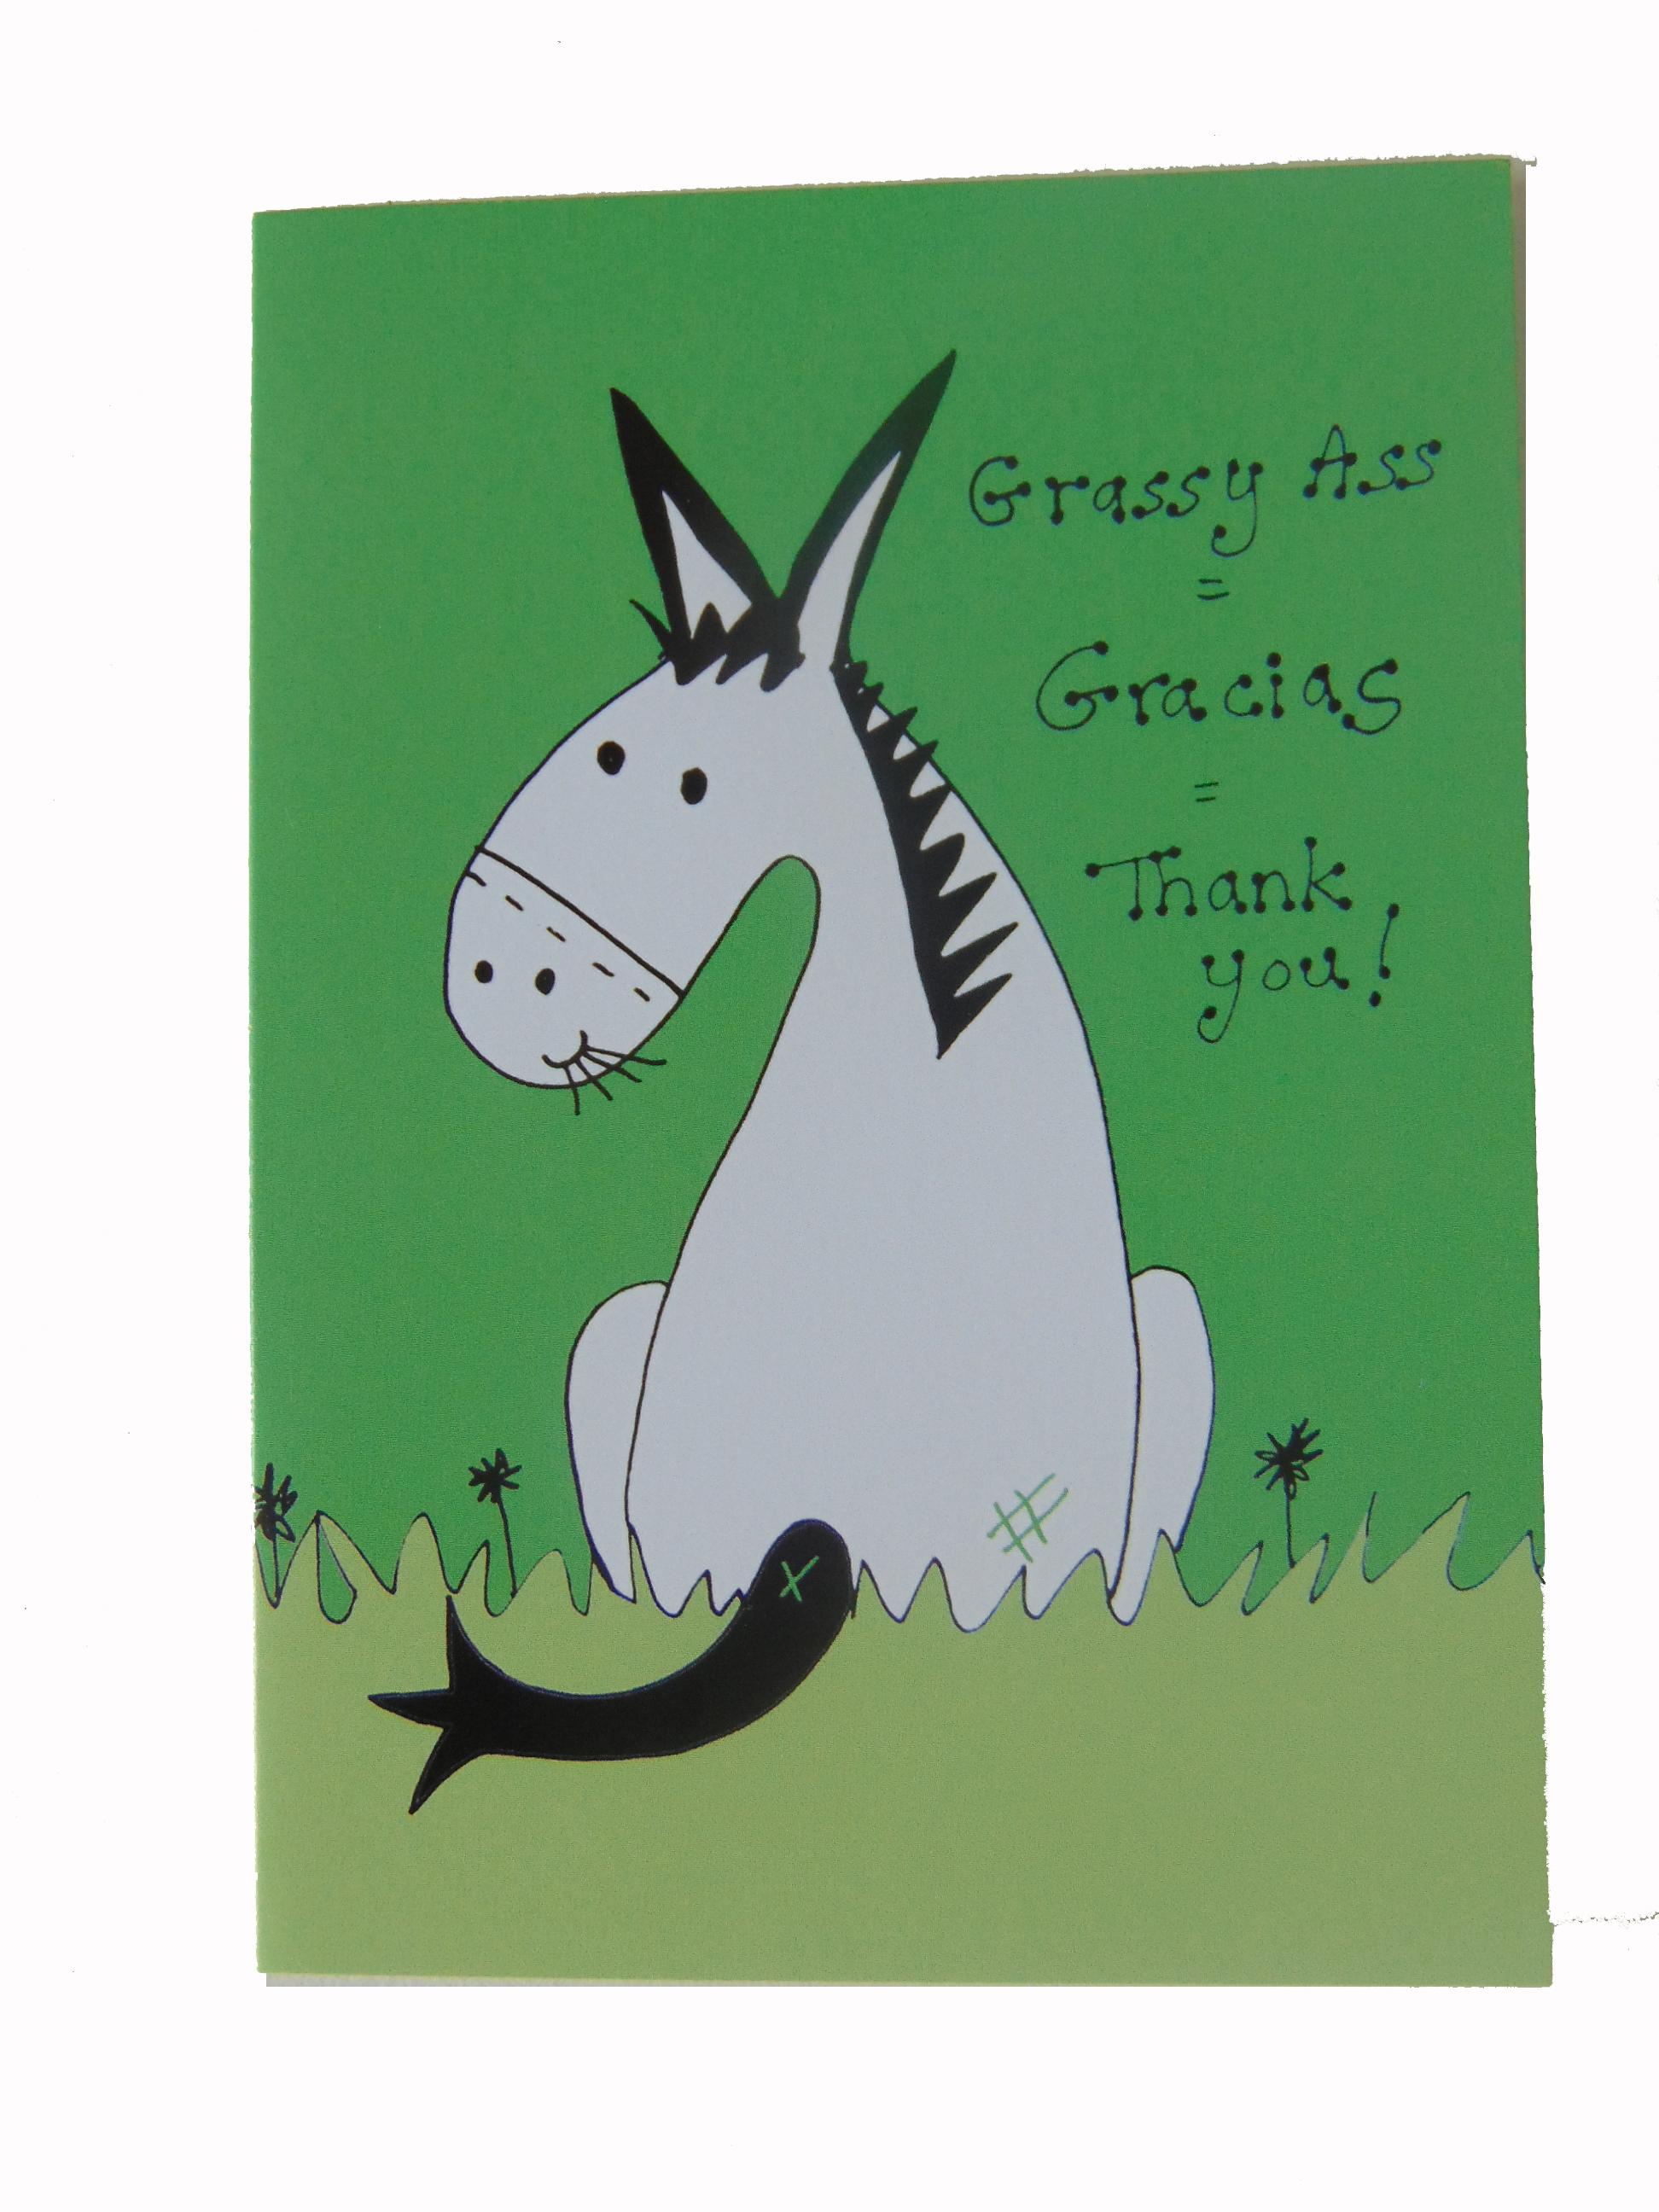 lgdf card grassy ass portrait.jpg